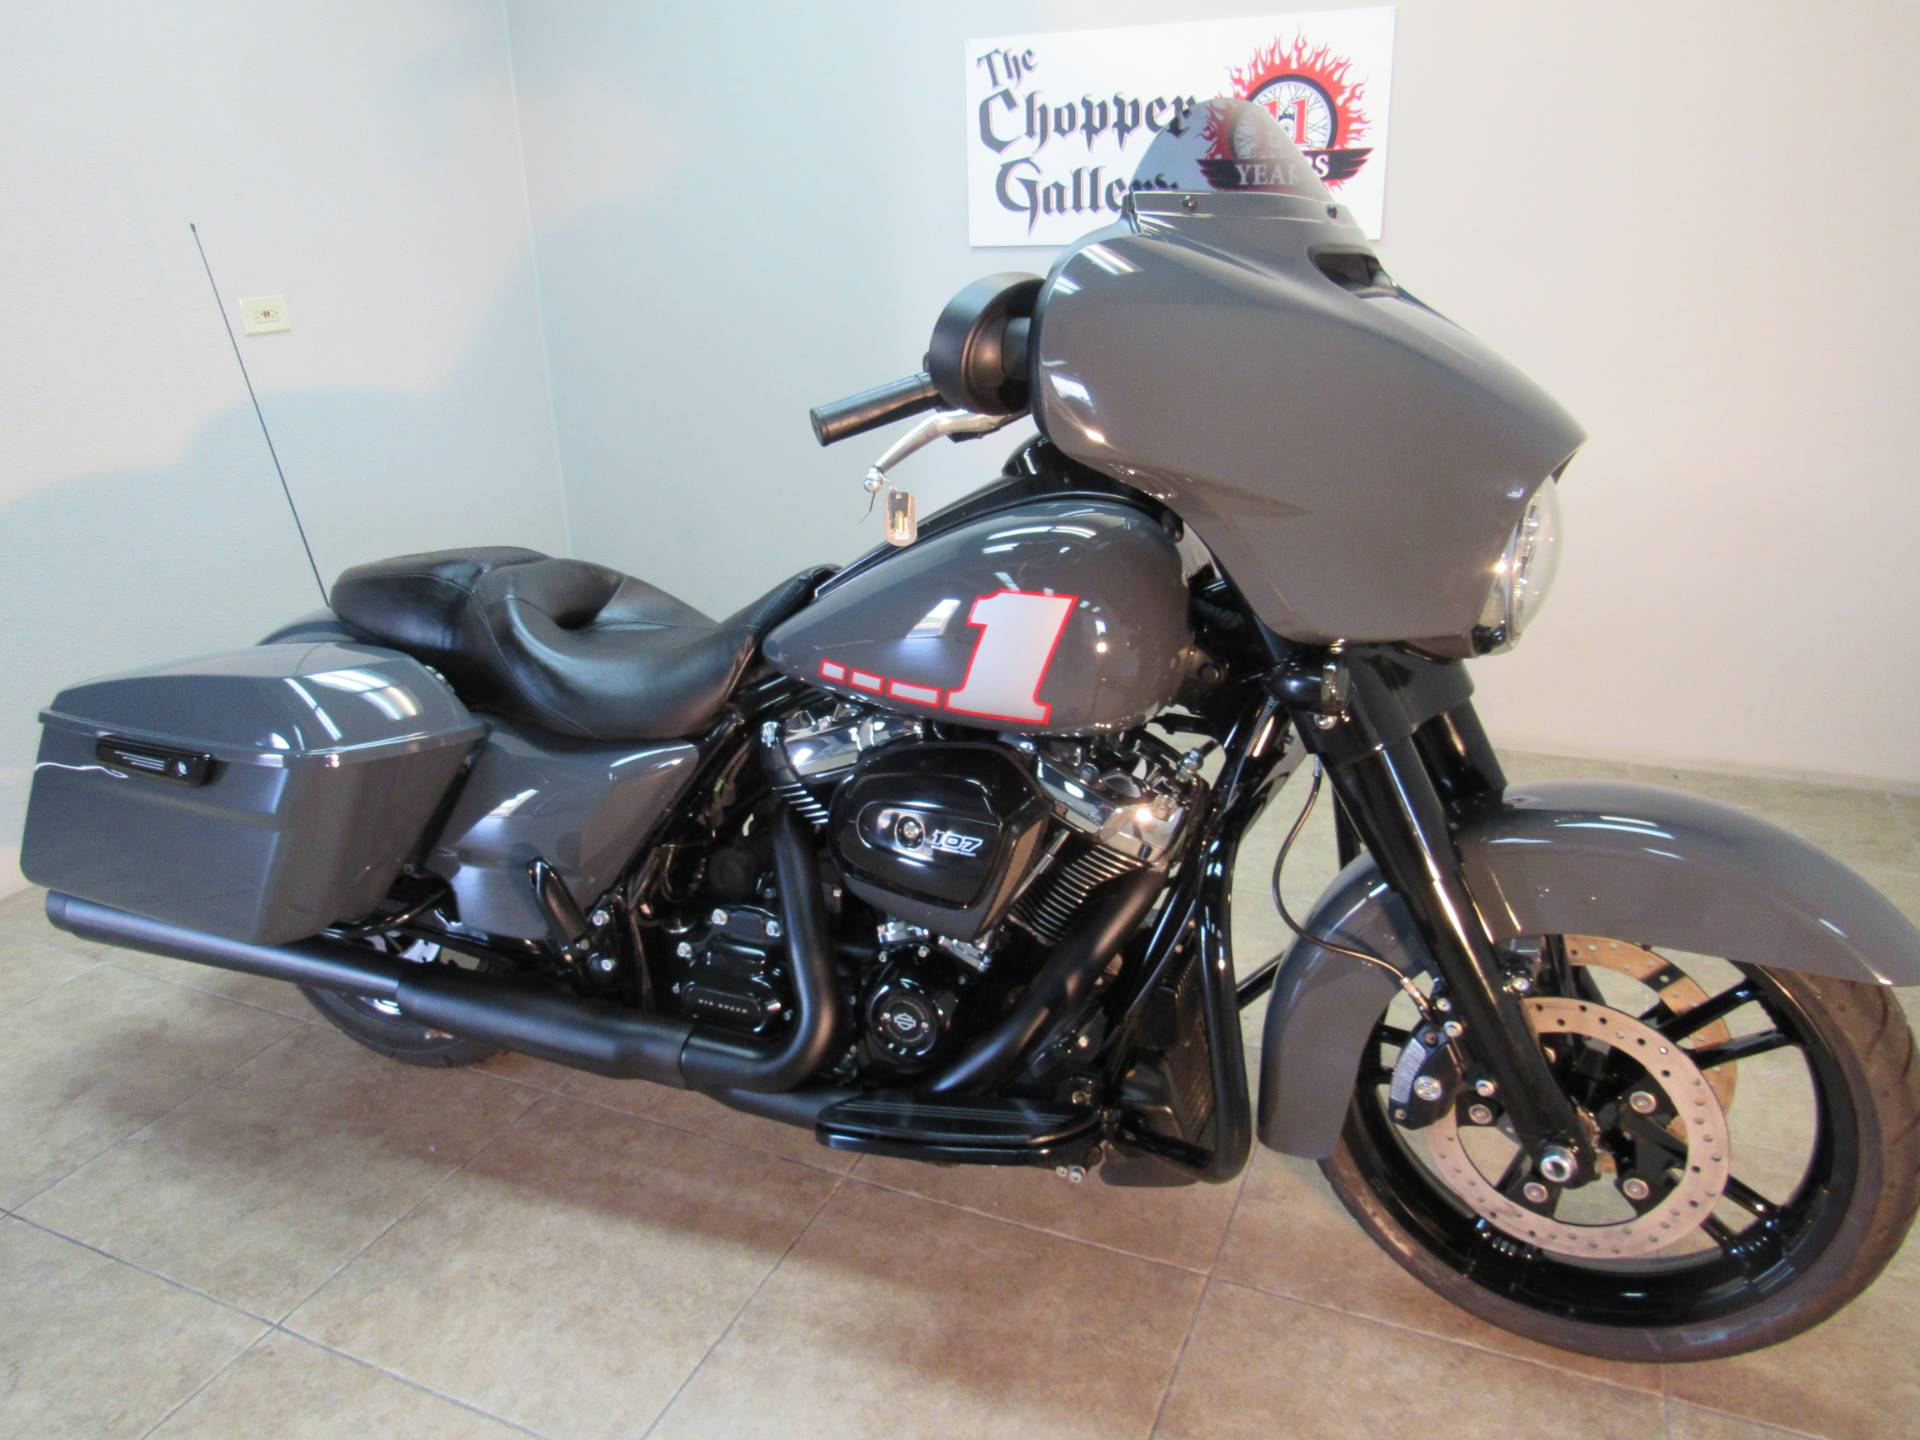 2018 Harley-Davidson Street Glide Special 6